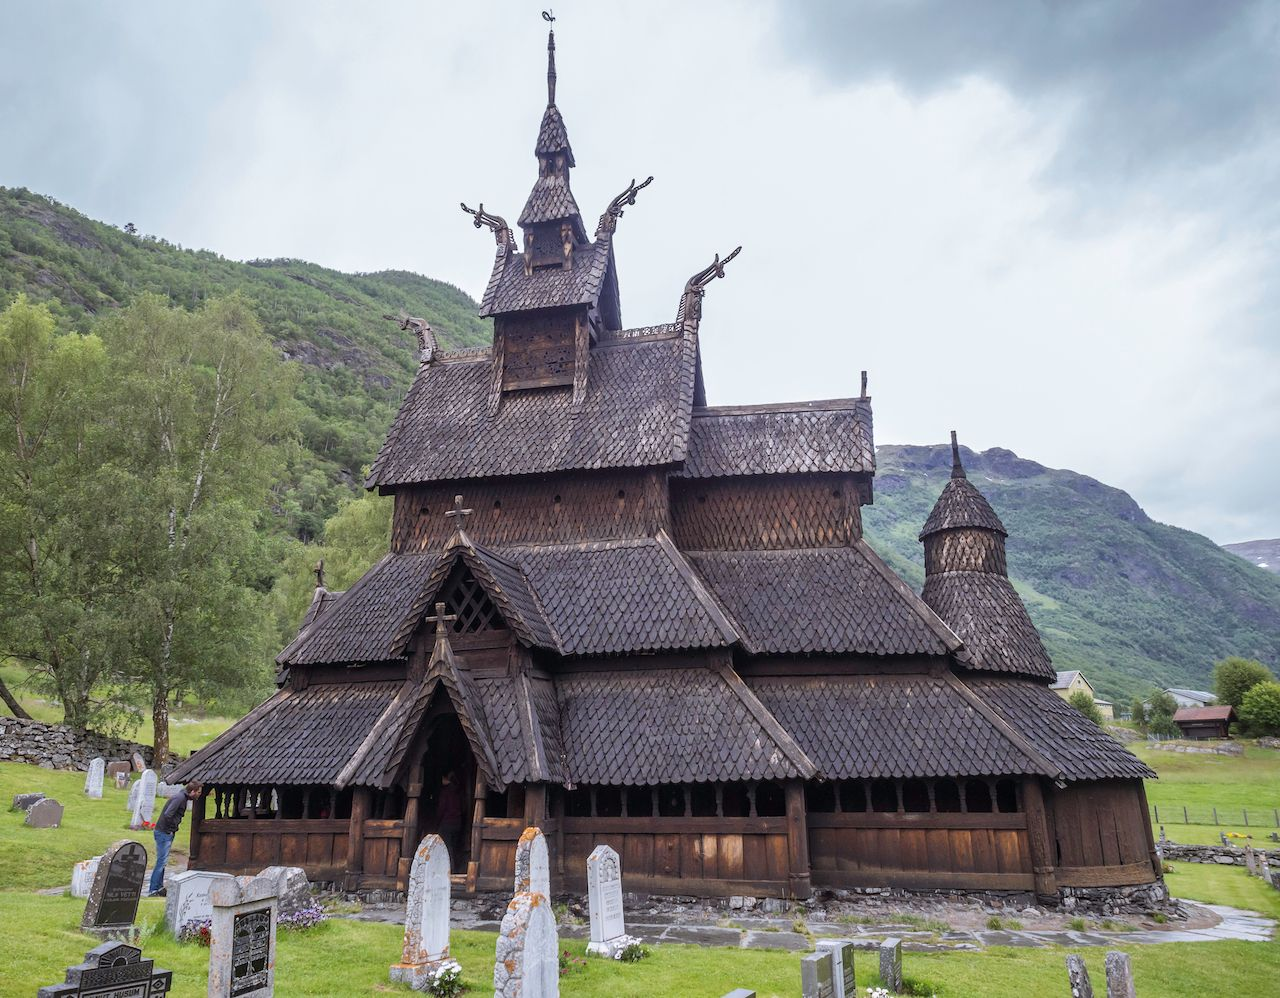 Graveyard Cemetery at Kaupanger Stavkirke, Norway